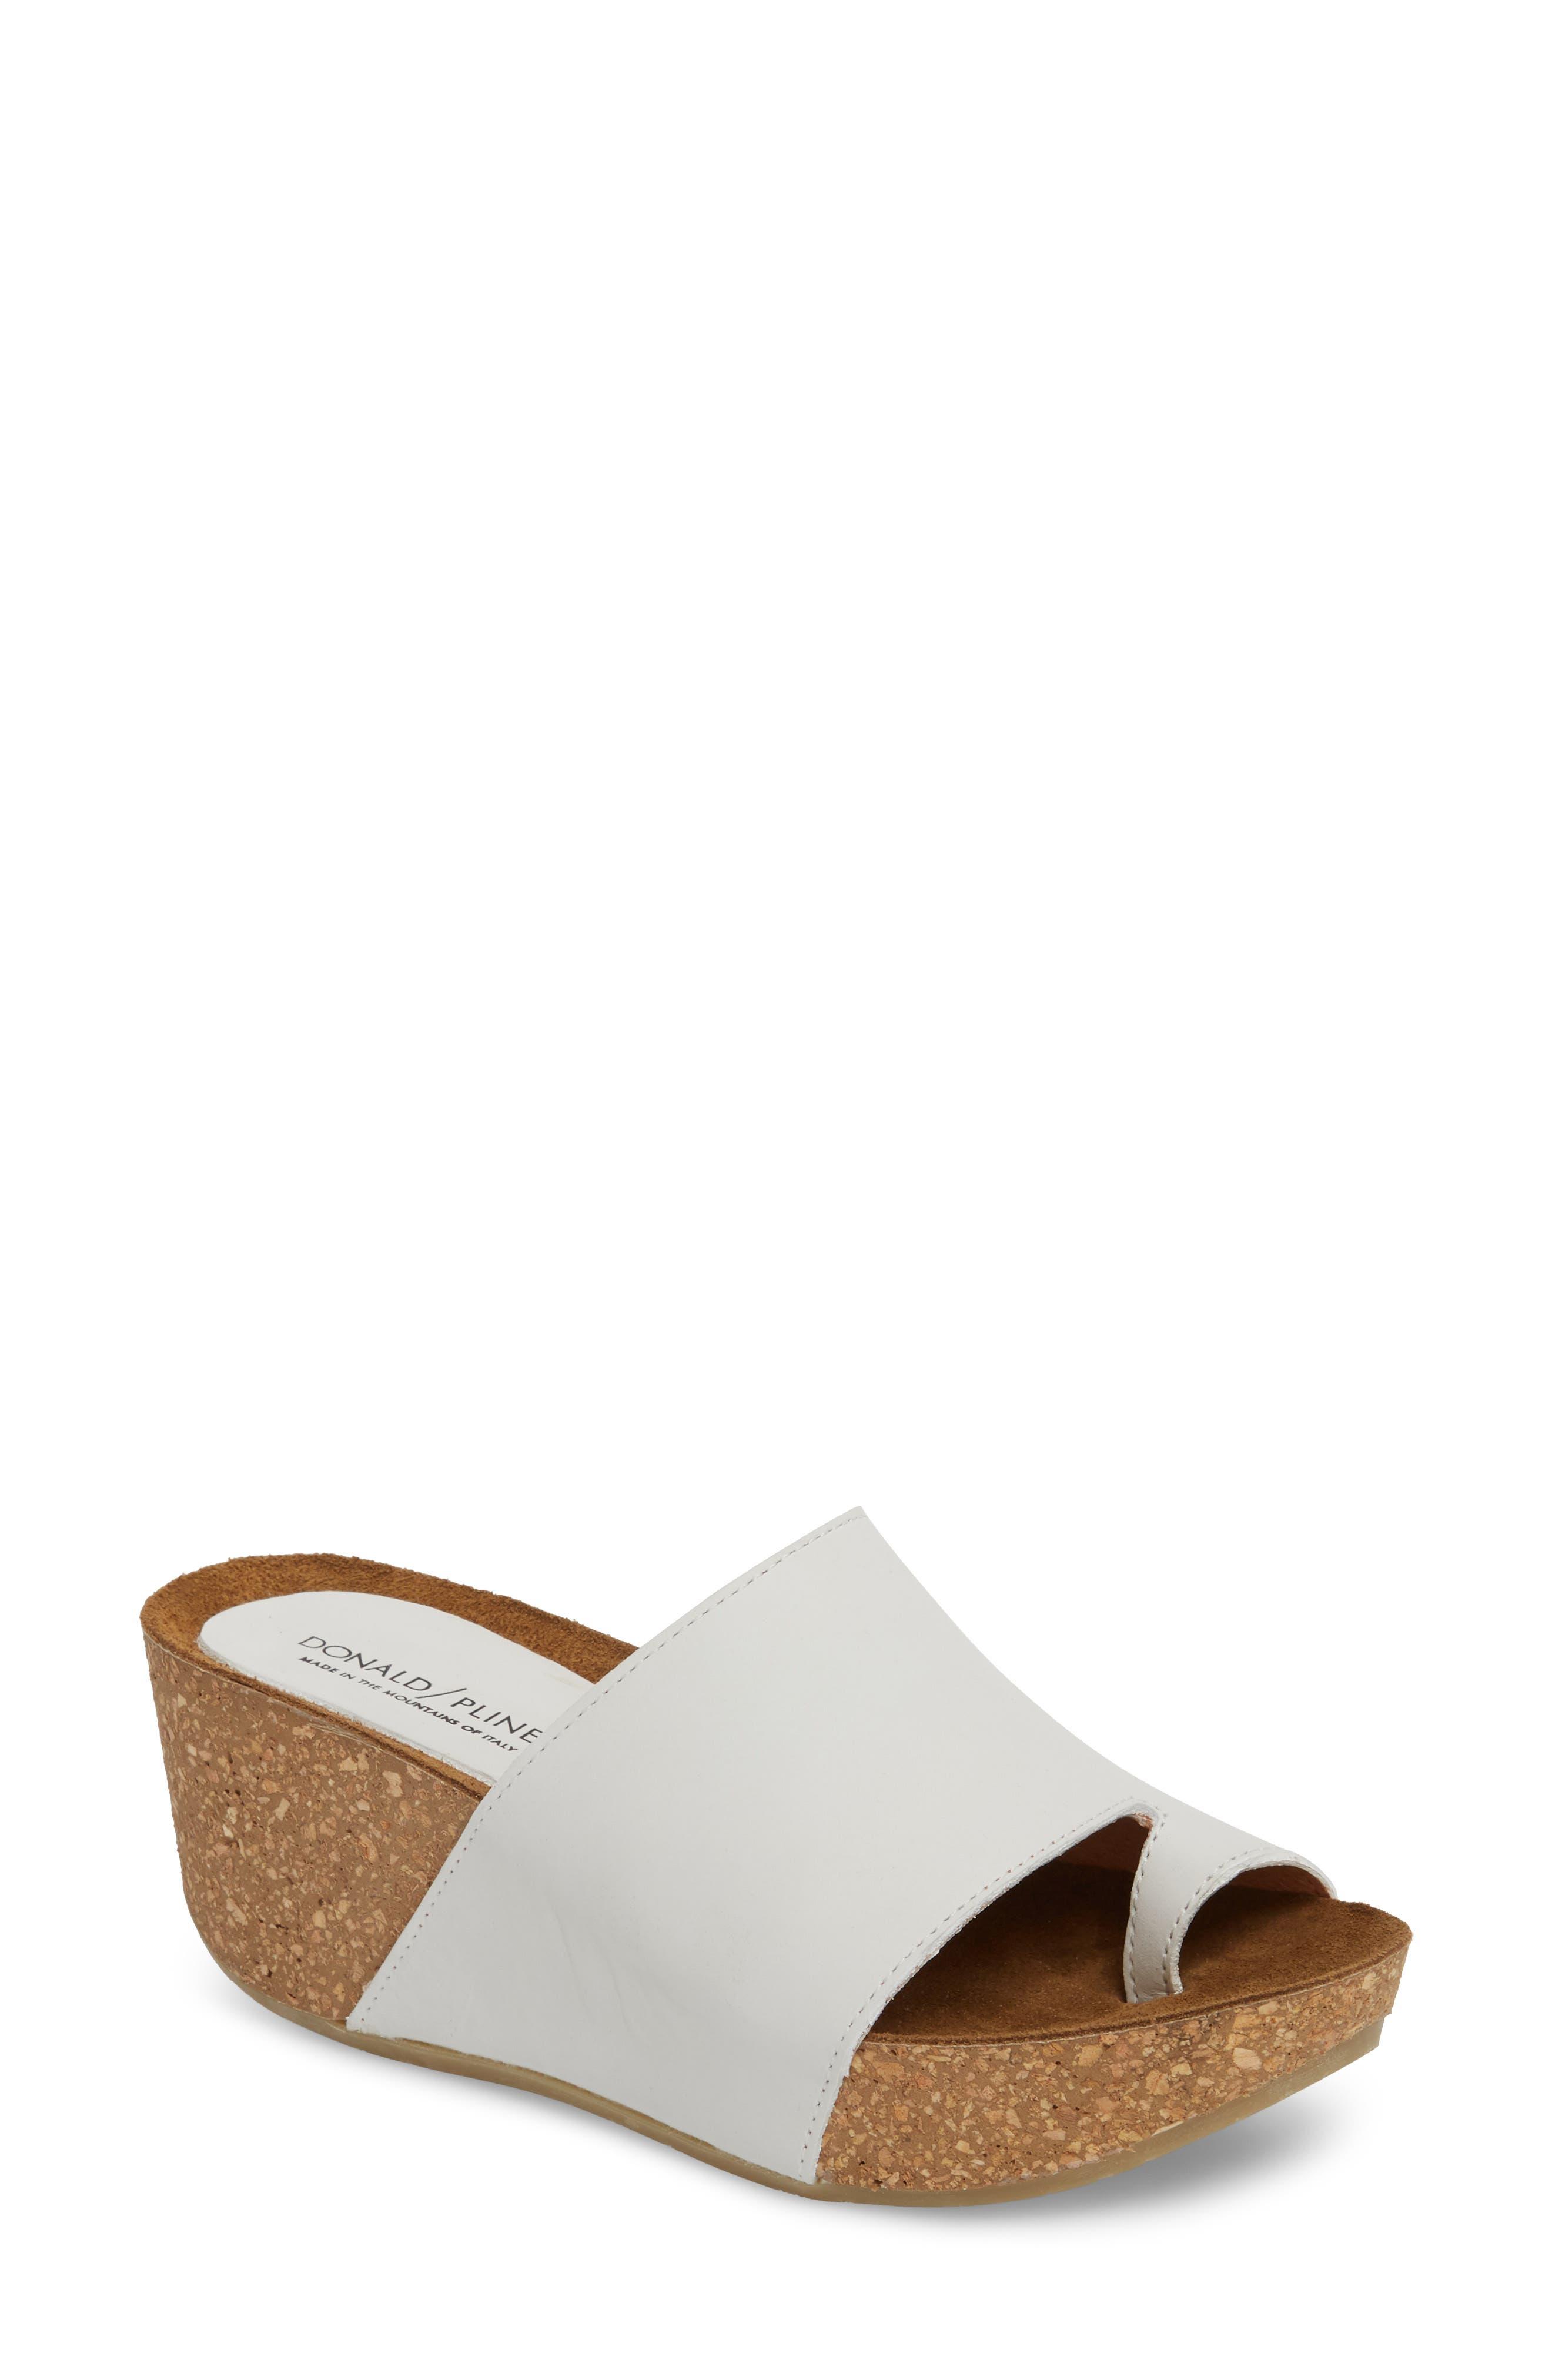 Donald J Pliner Ginie Platform Wedge Sandal,                             Main thumbnail 1, color,                             Bone Leather